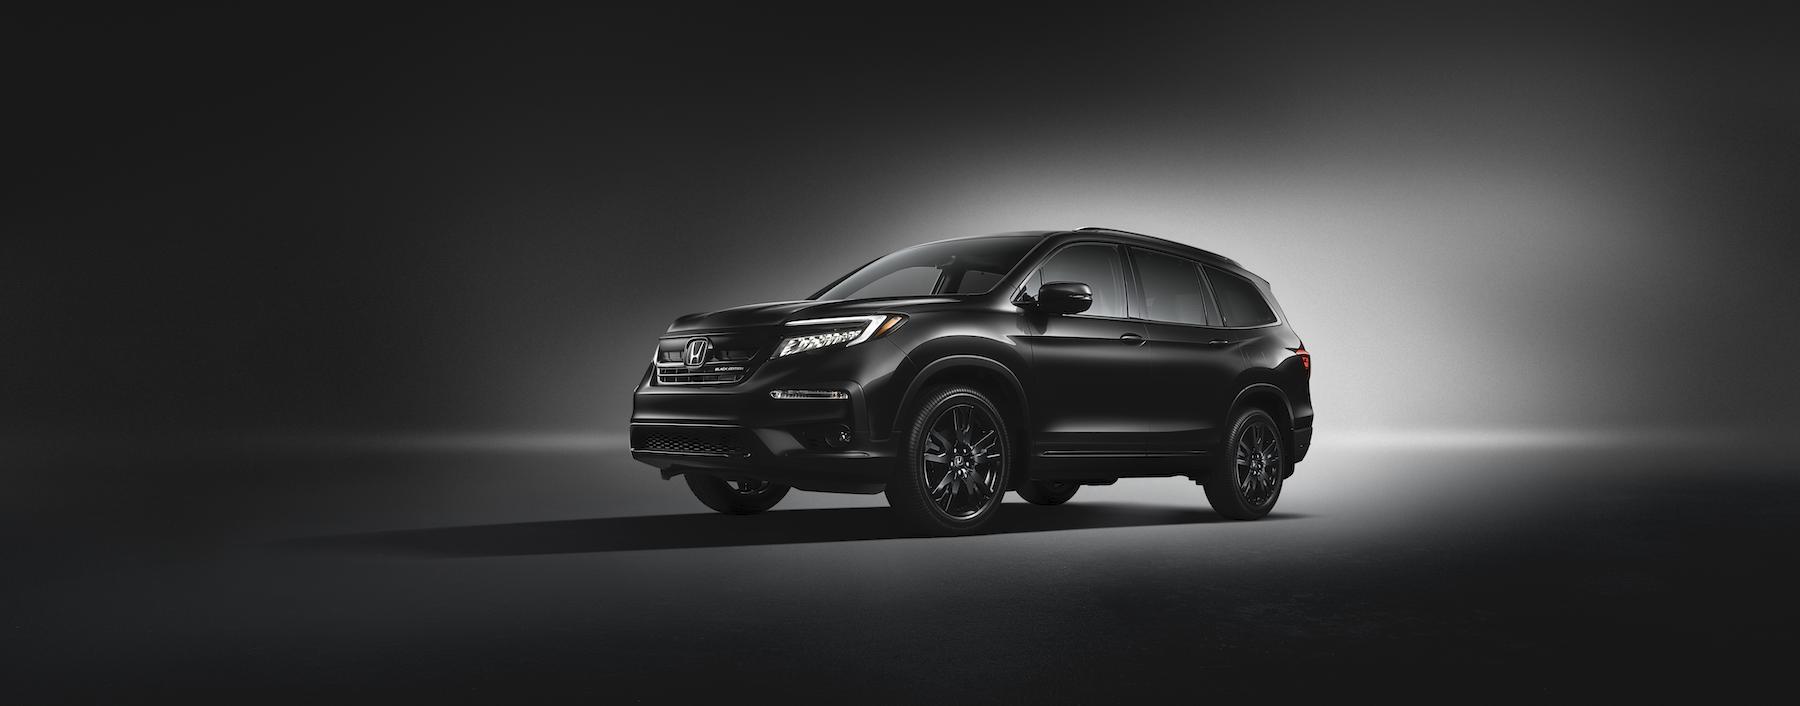 Boch Honda is a Car Dealership near Brockton MA | 2020 Honda Pilot with black background